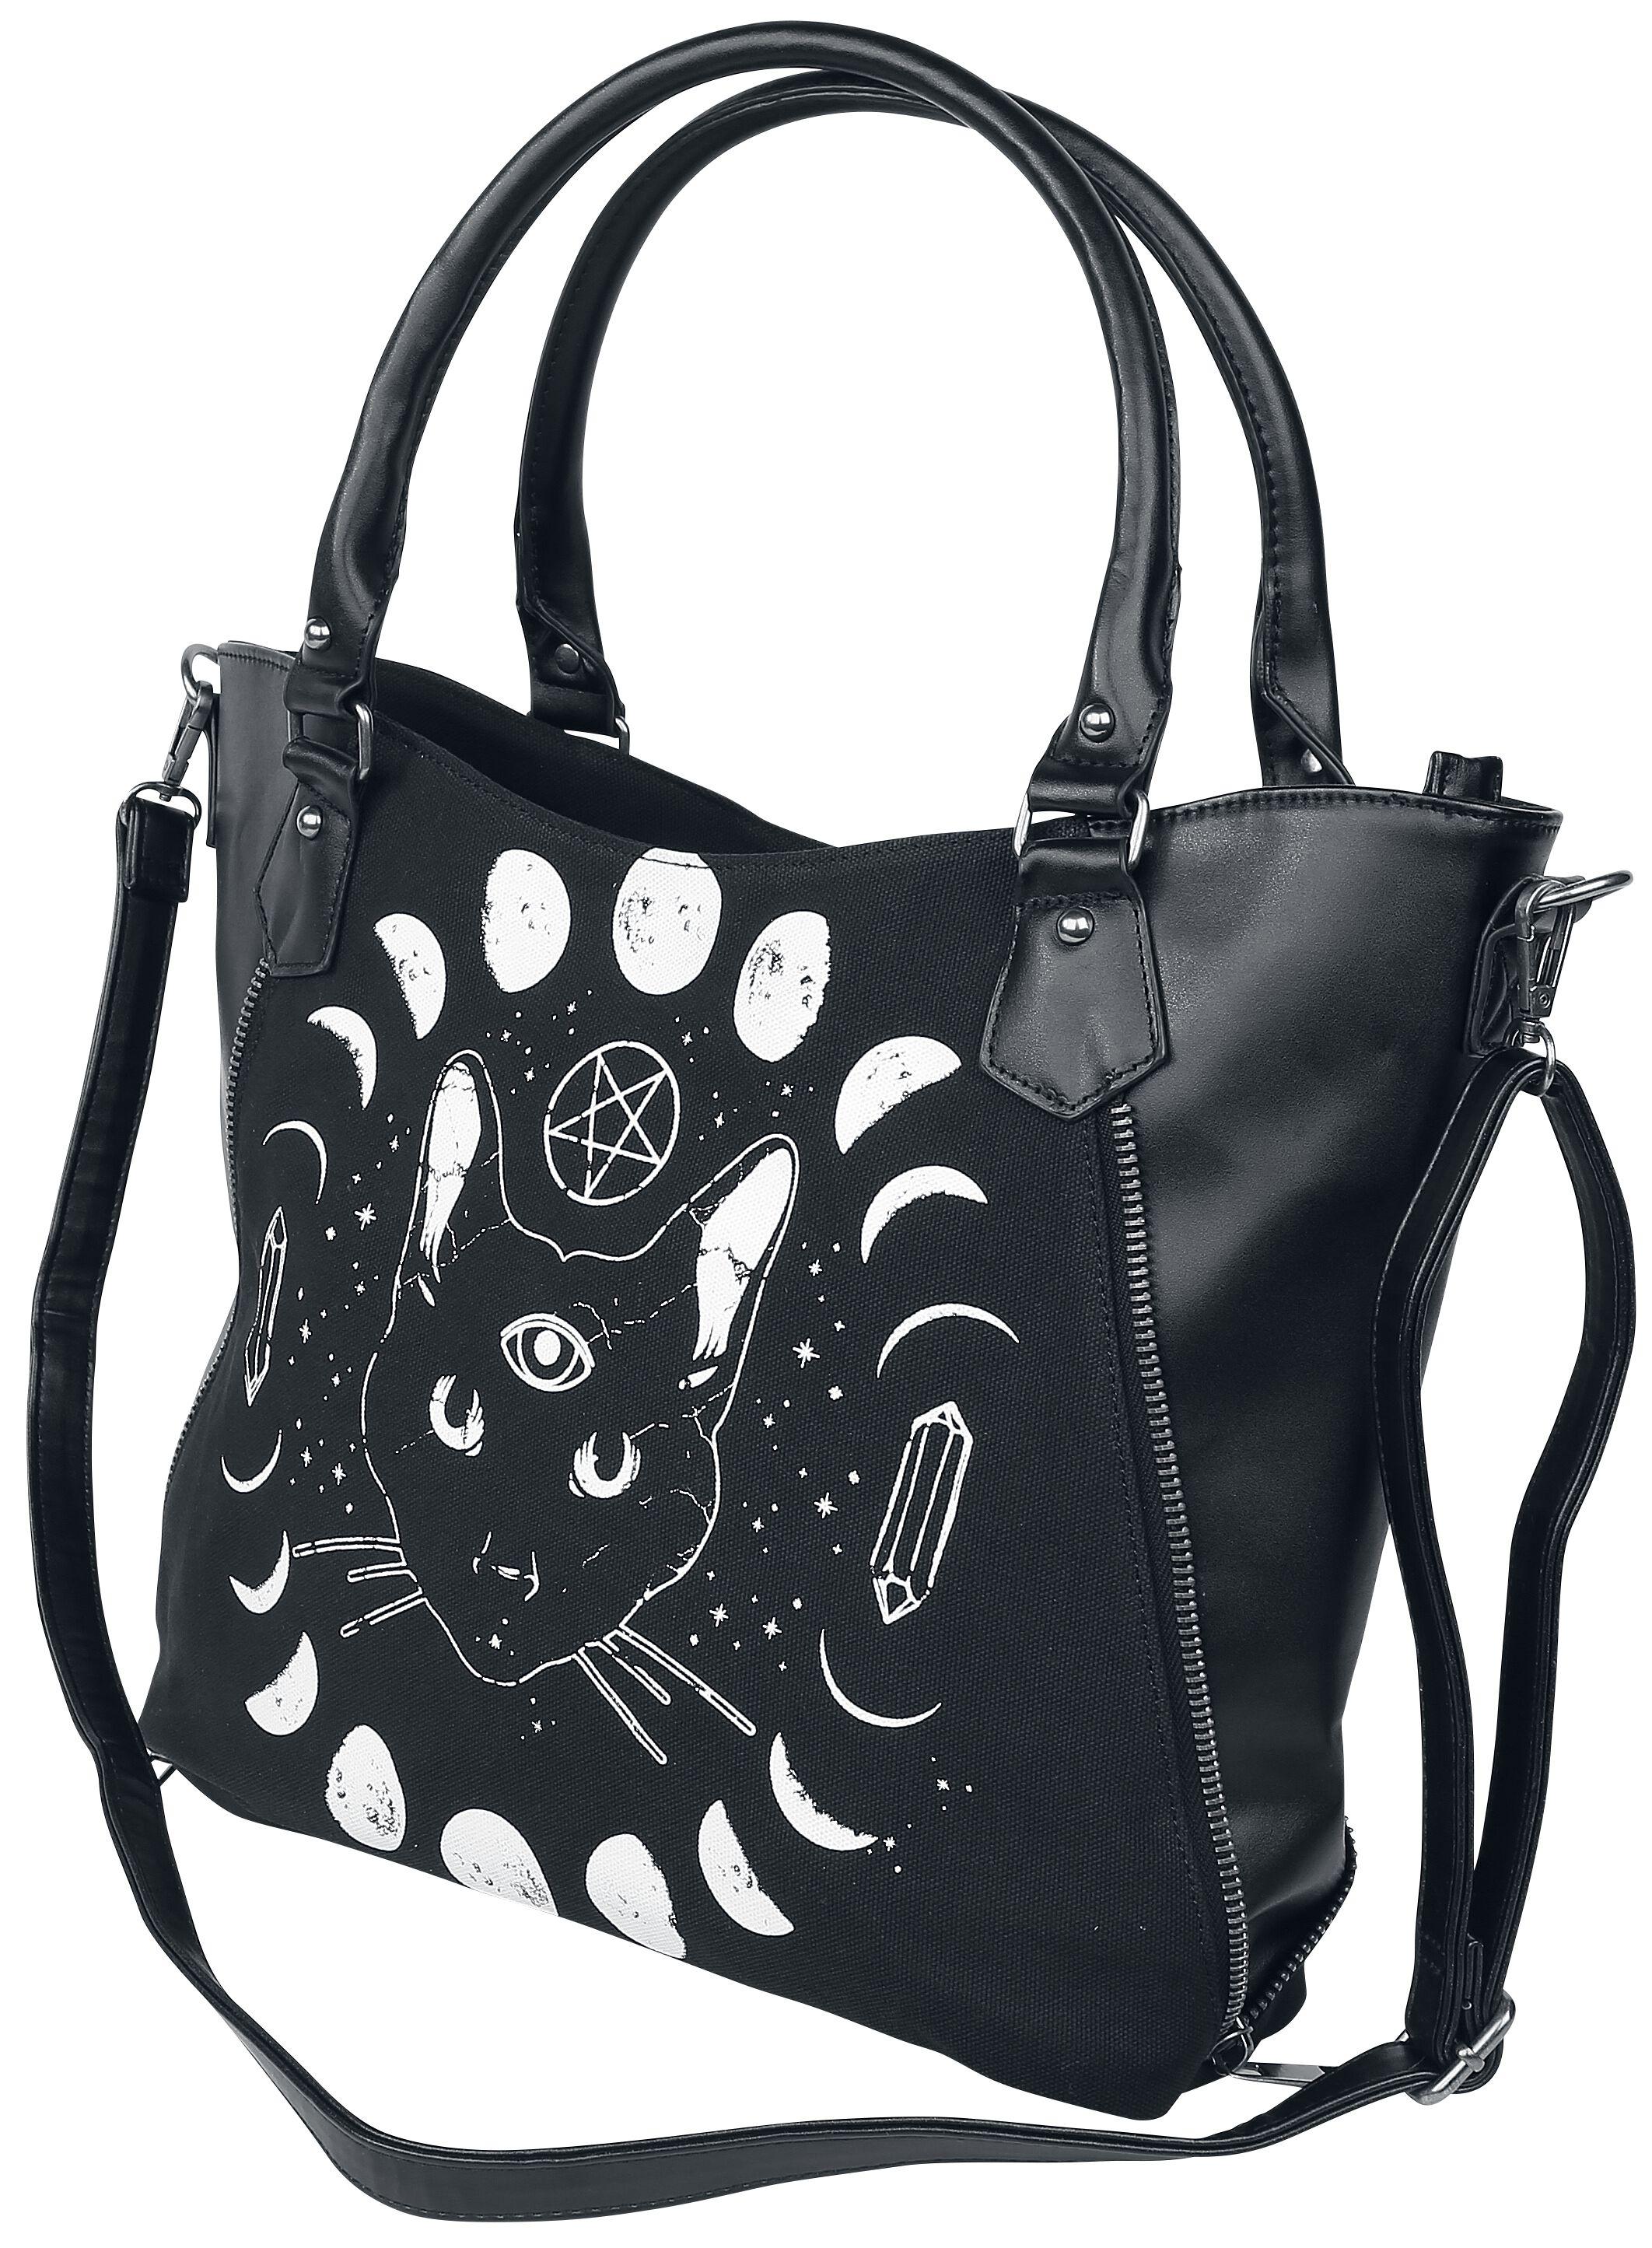 Handtaschen - Banned Alternative Pentacle Coven Handtasche schwarz  - Onlineshop EMP